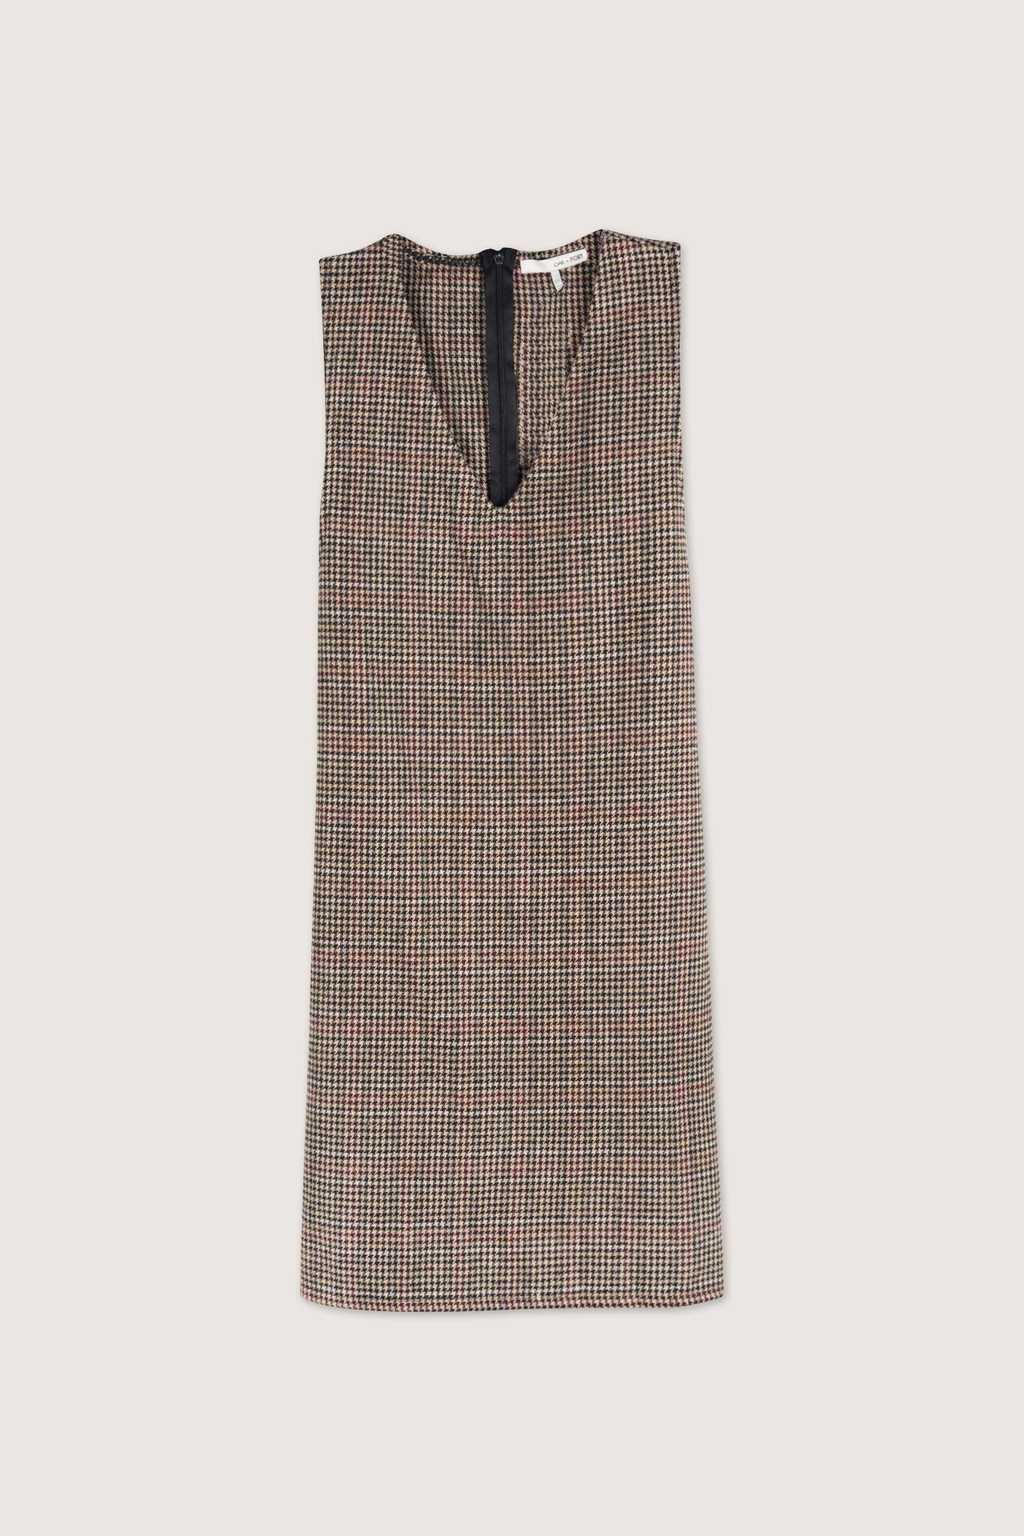 Dress H321 Brown 10